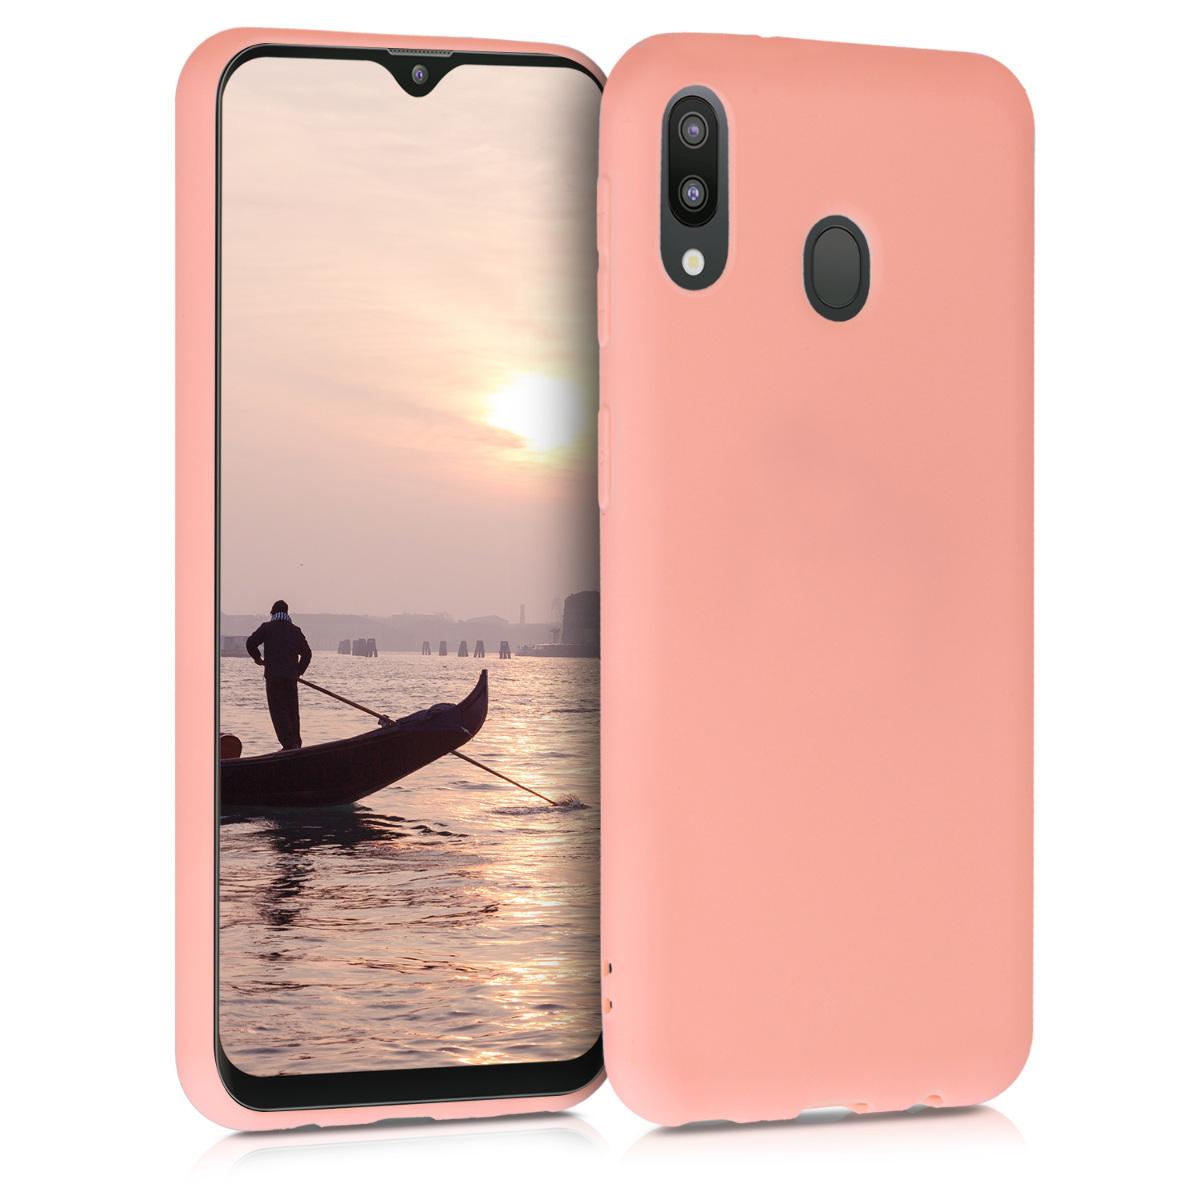 KW Θήκη Σιλικόνης Samsung Galaxy M20 - Coral Matte (48309.56)